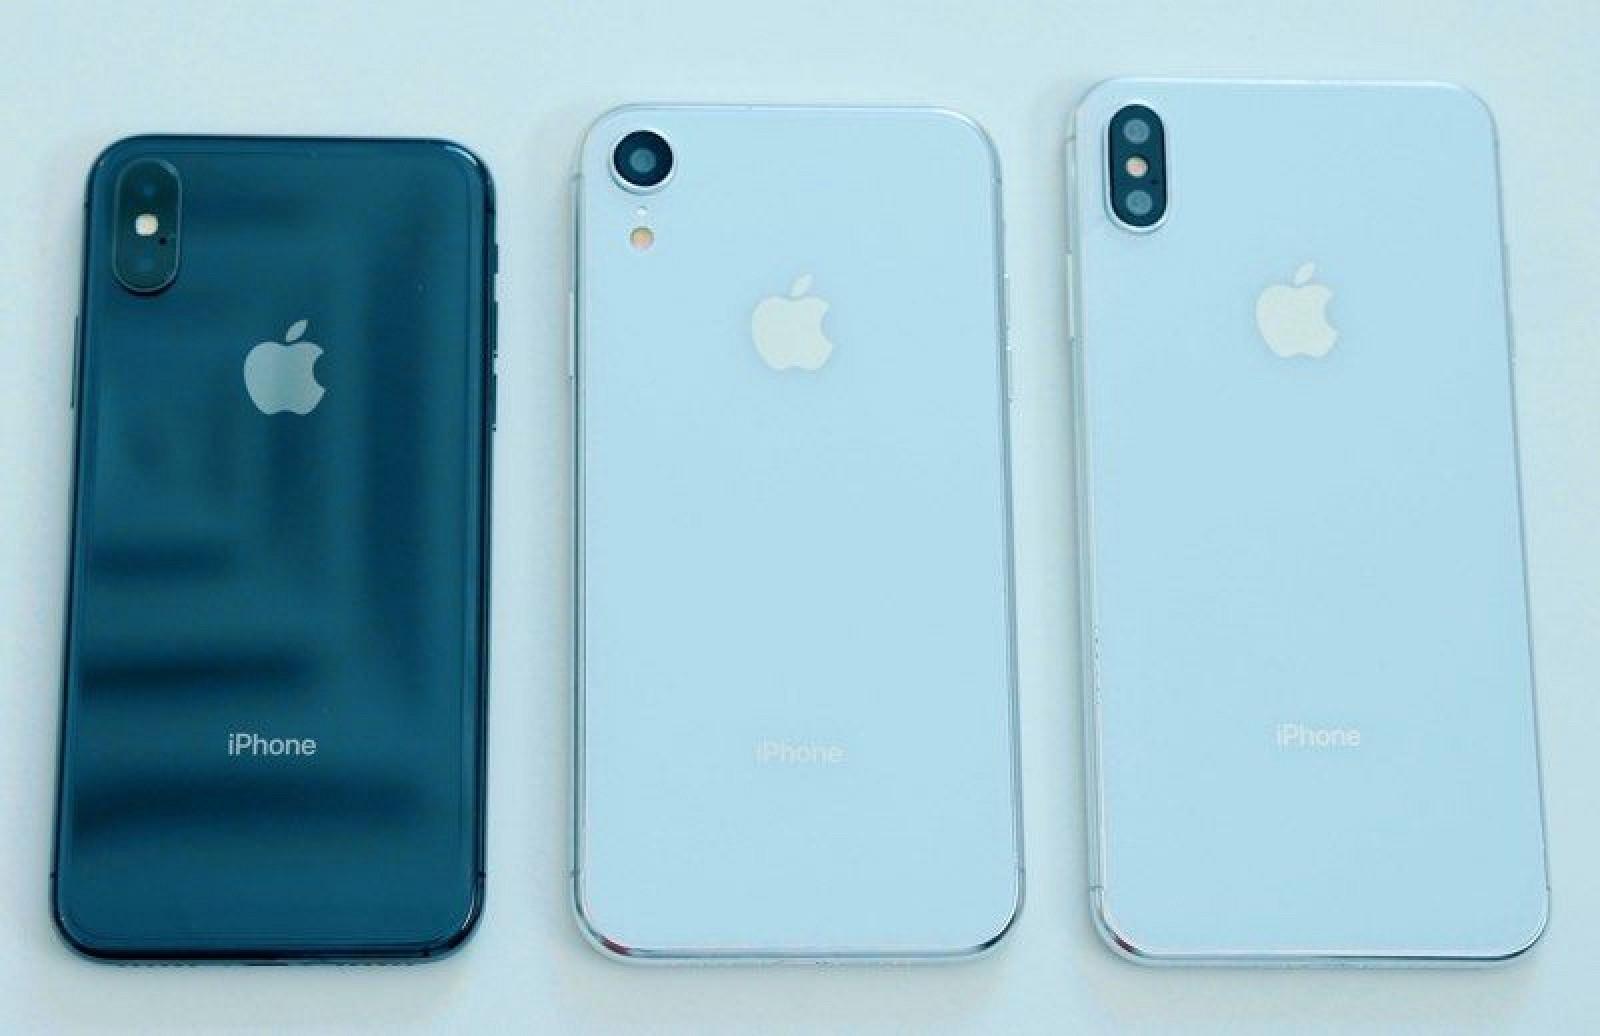 iPhone مؤتمر أبل